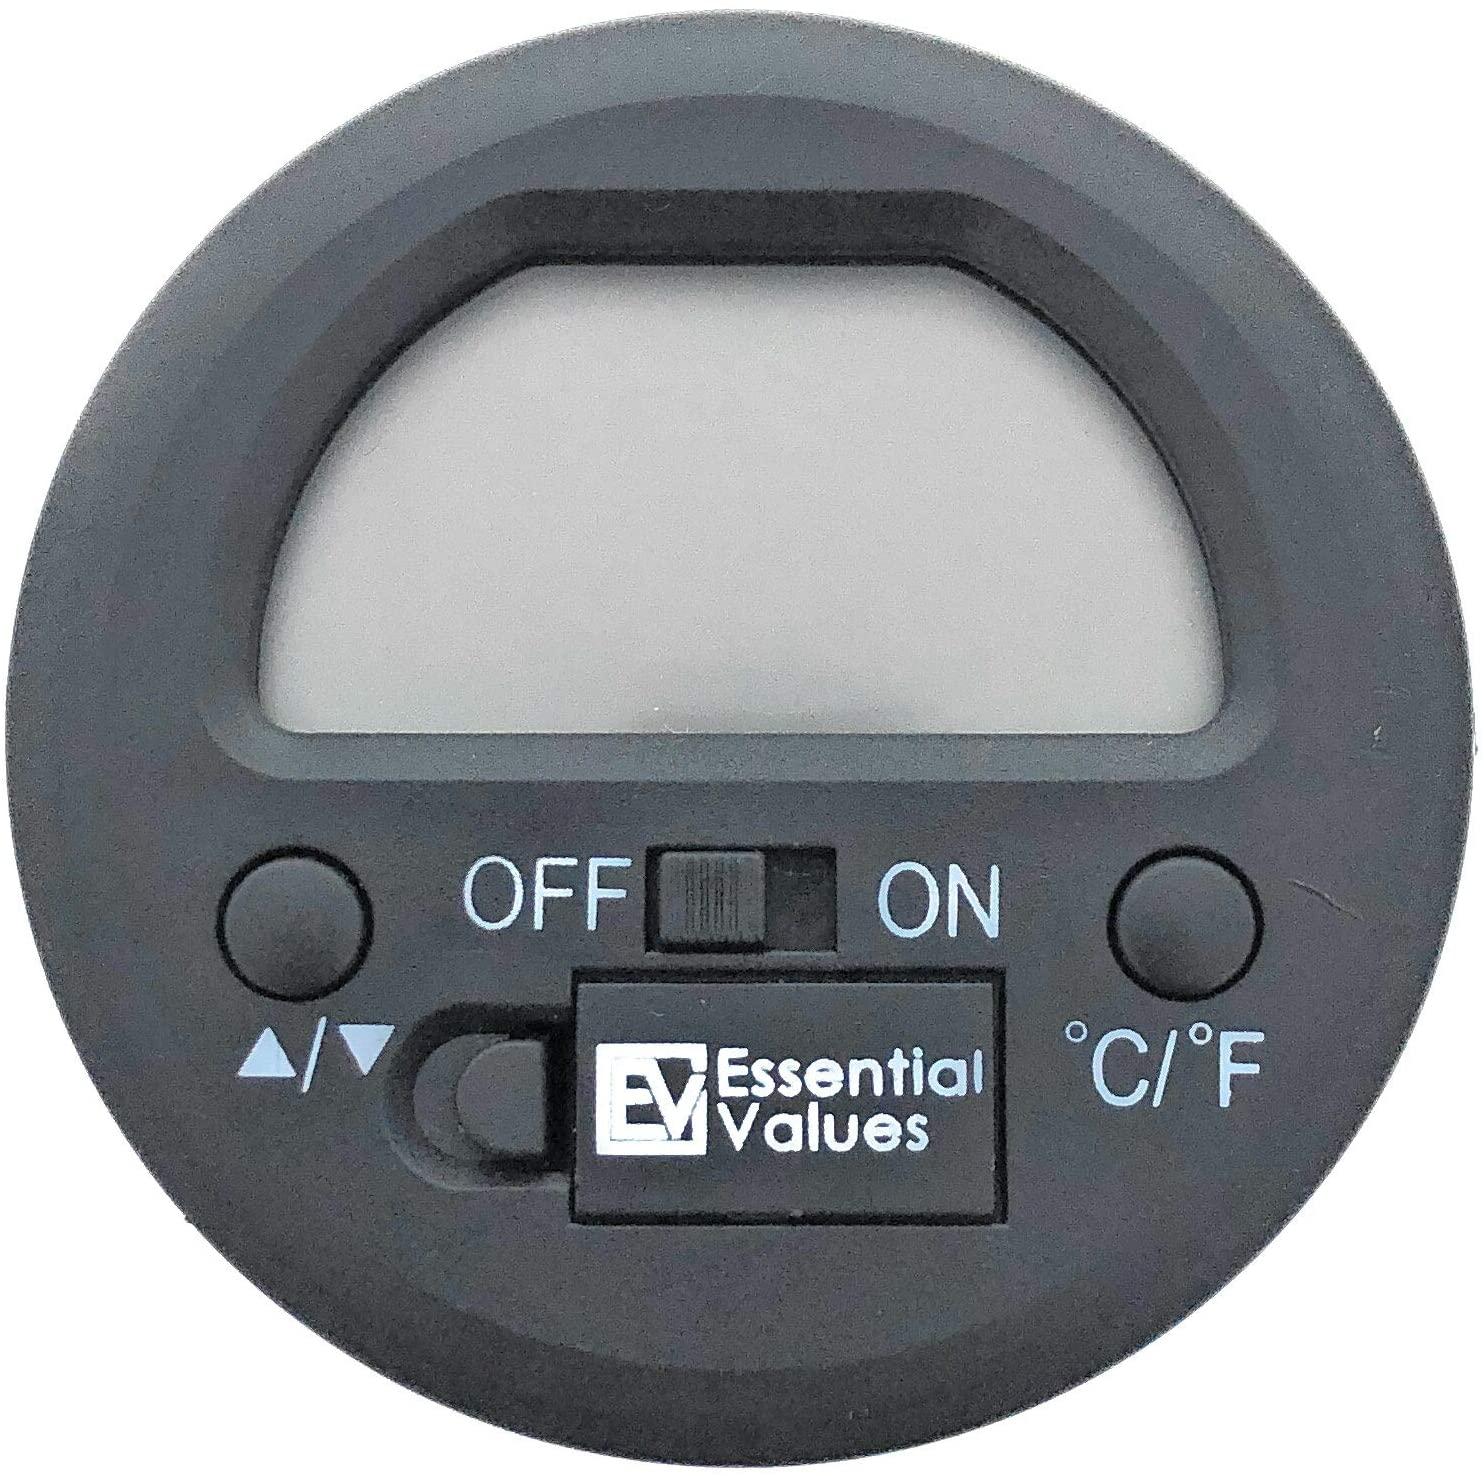 Essential Values Round Digital Cigar Hygrometer